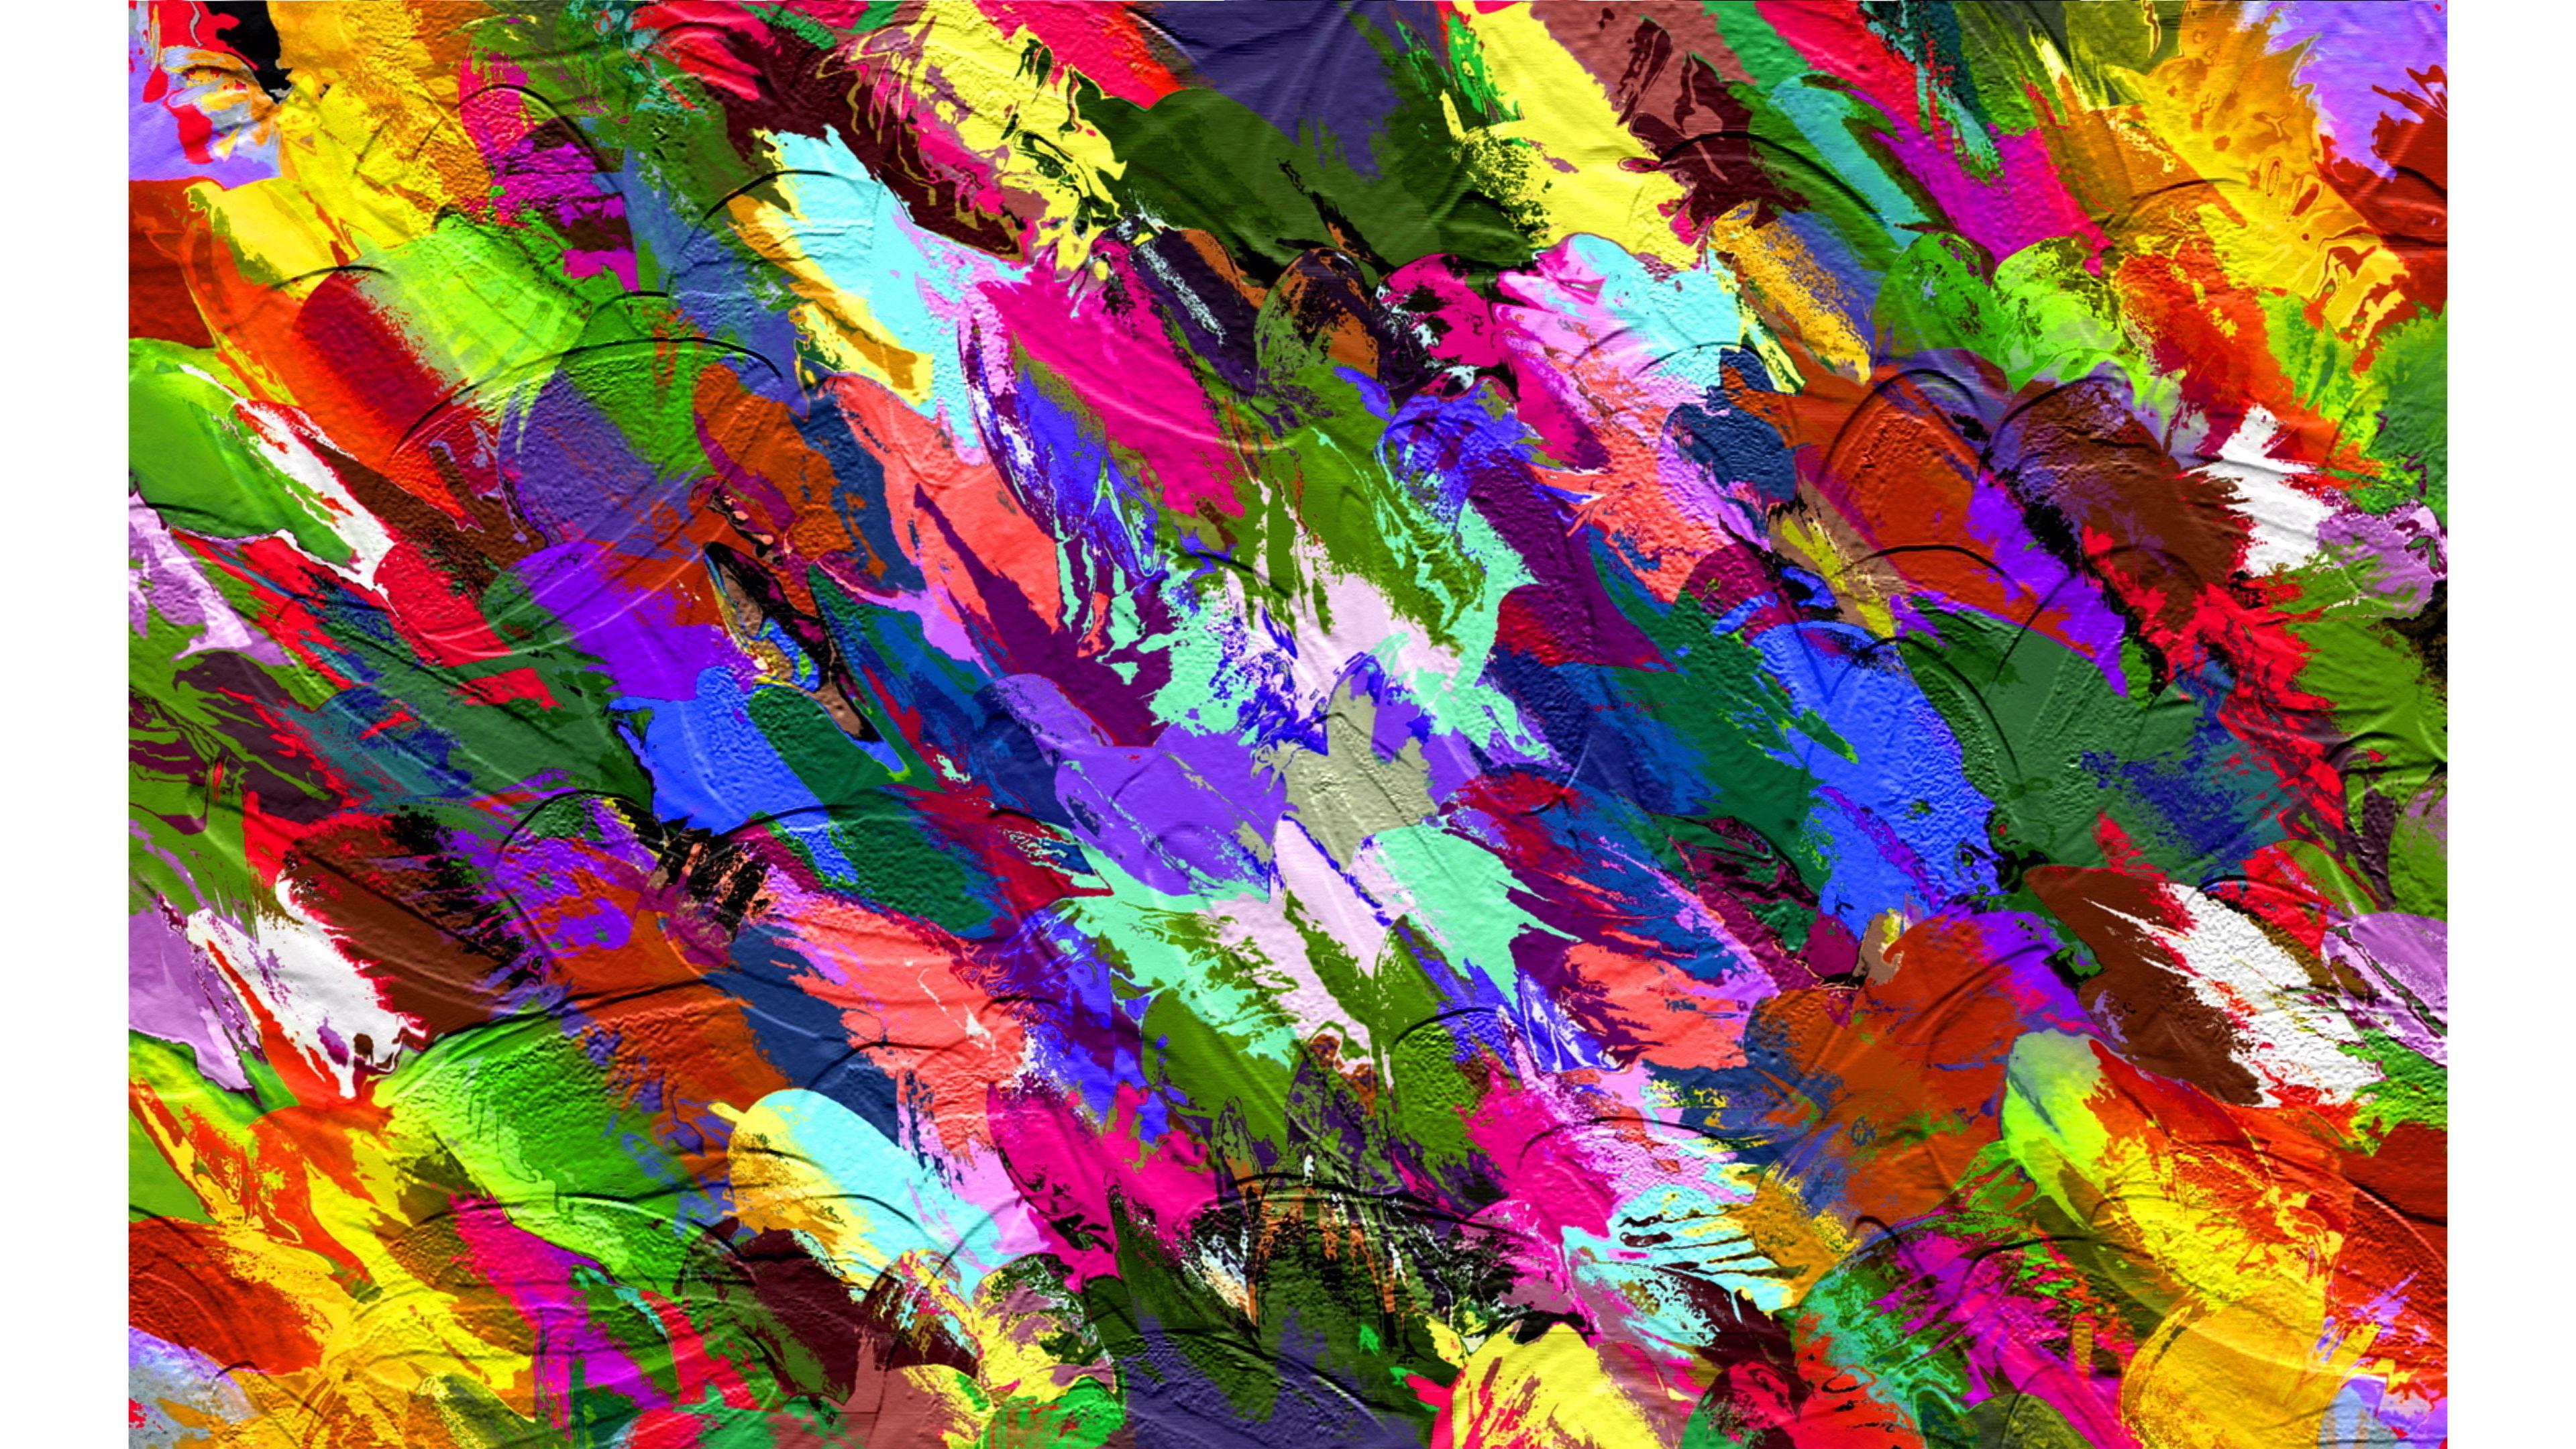 Wallpapers Color Splash - Wallpaper Cave